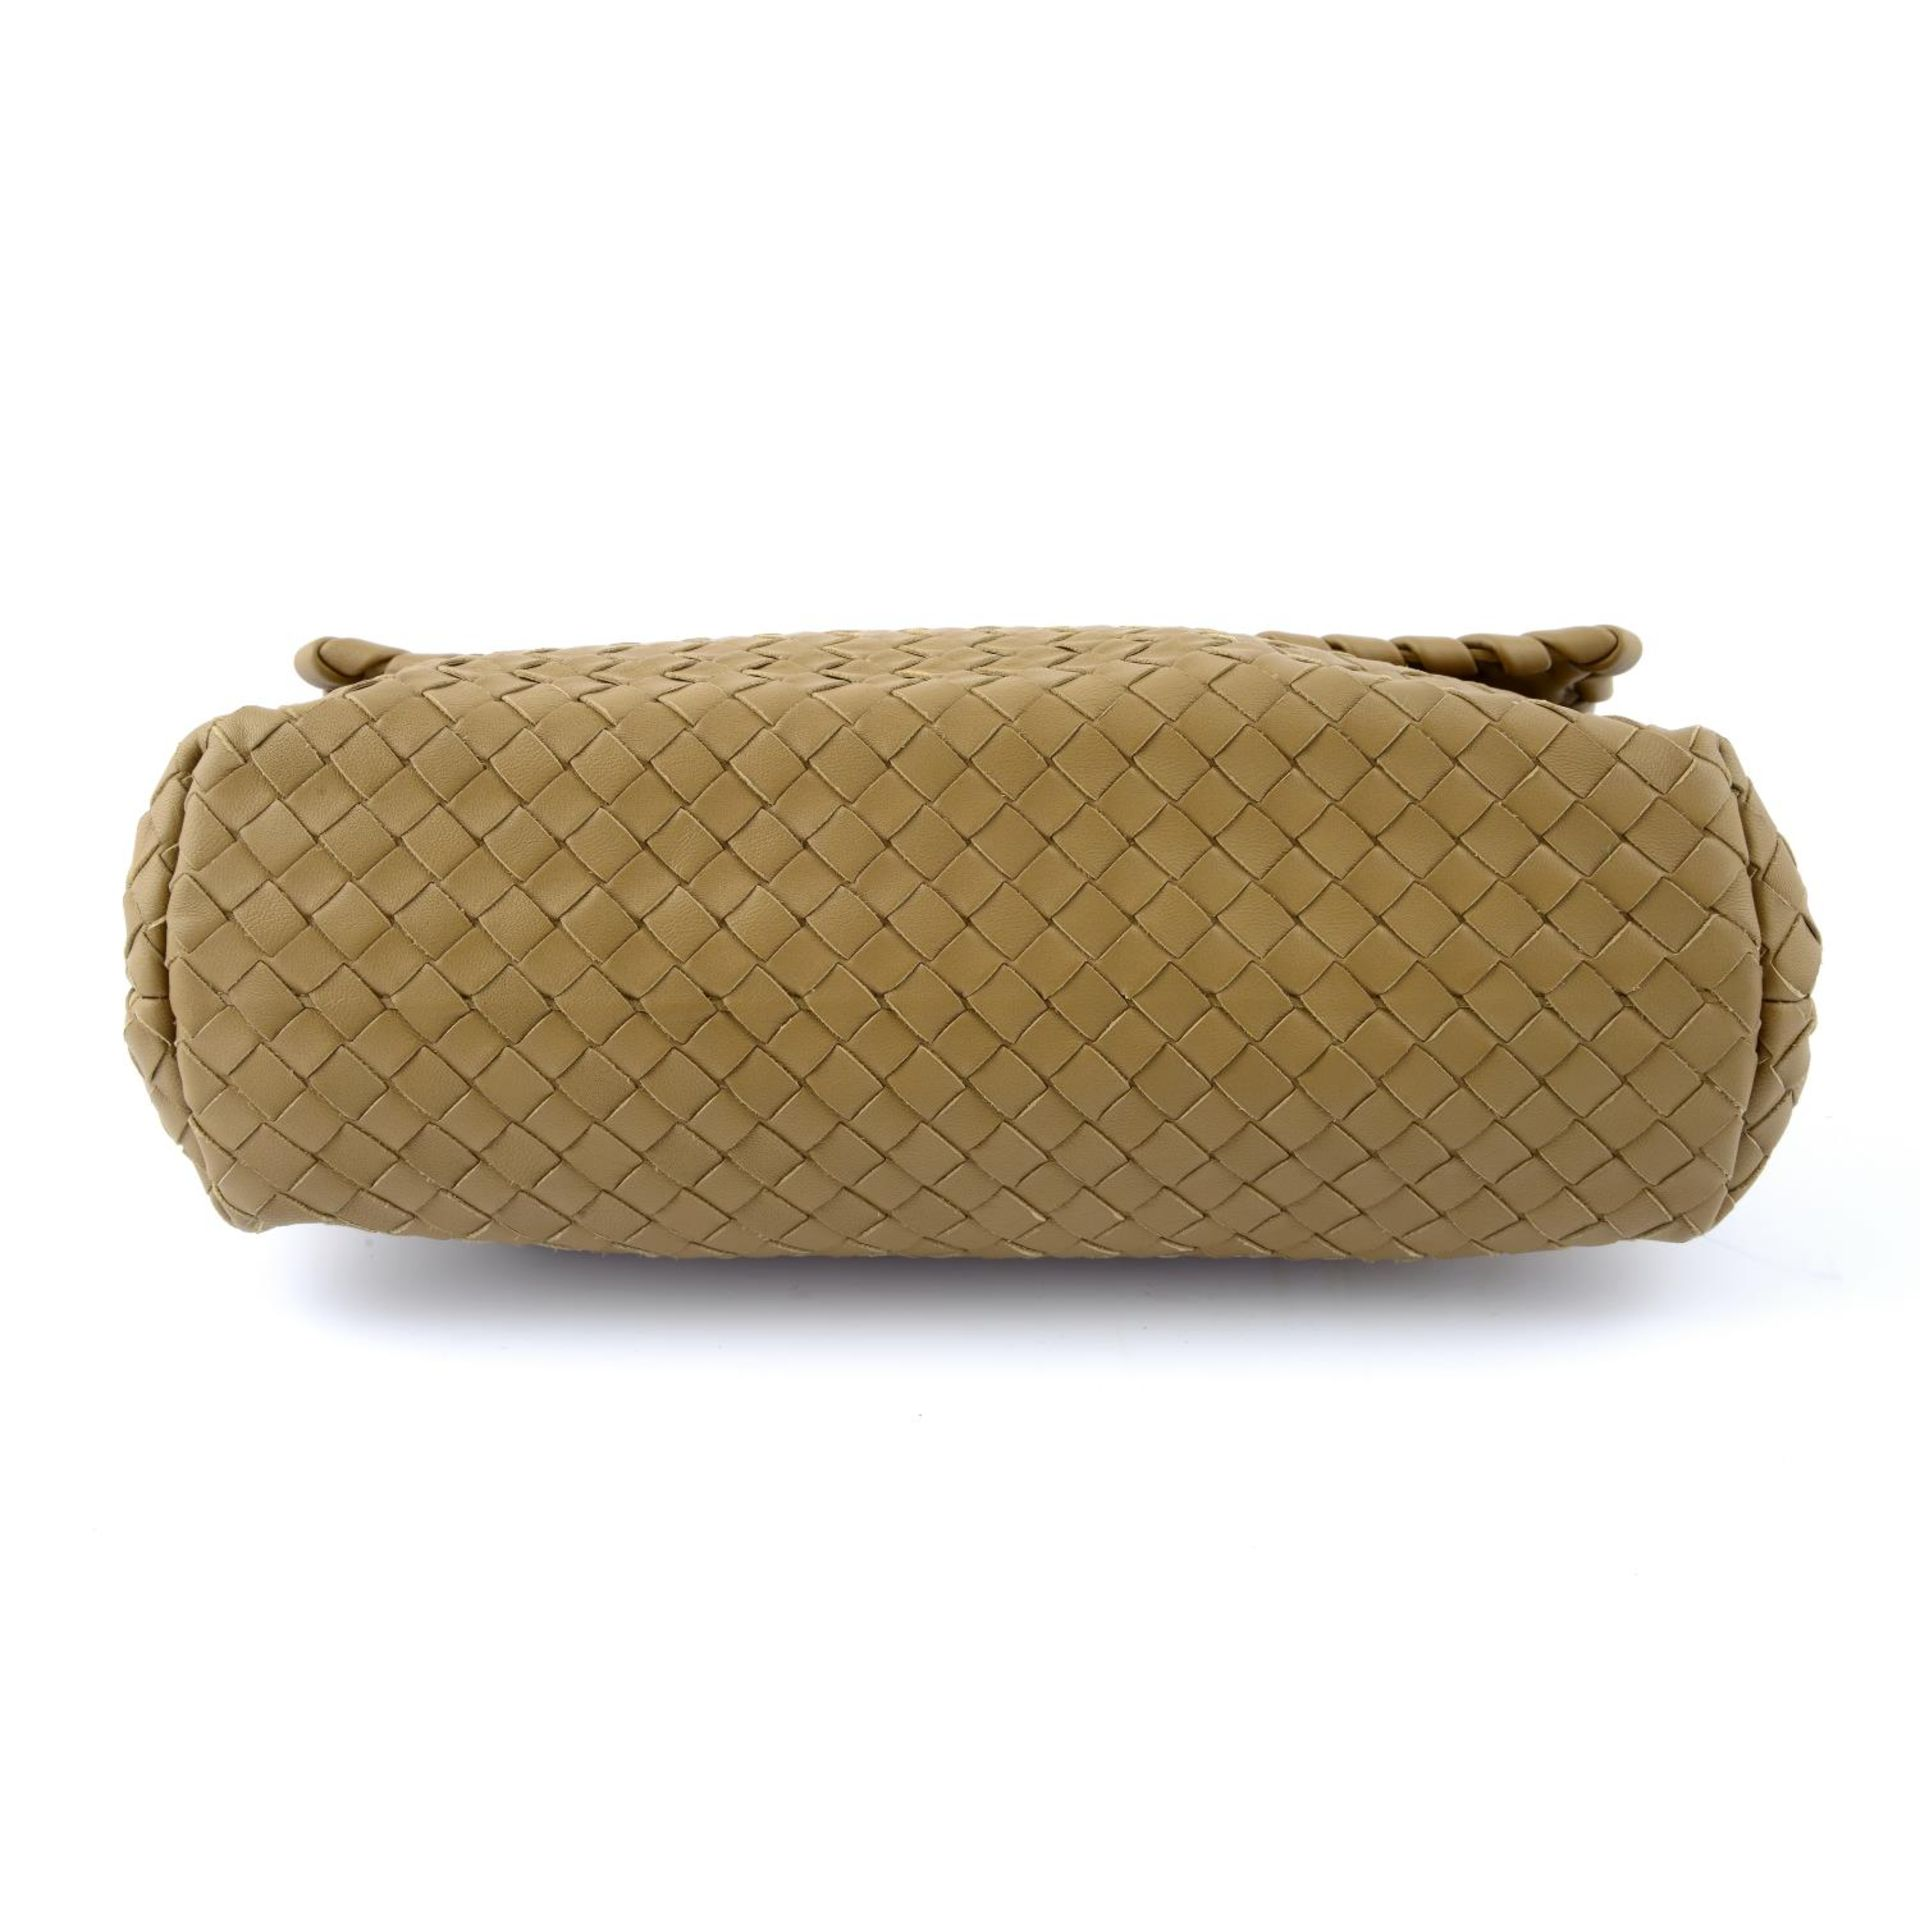 BOTTEGA VENETA - a fold over Intrecciato handbag. - Image 5 of 5